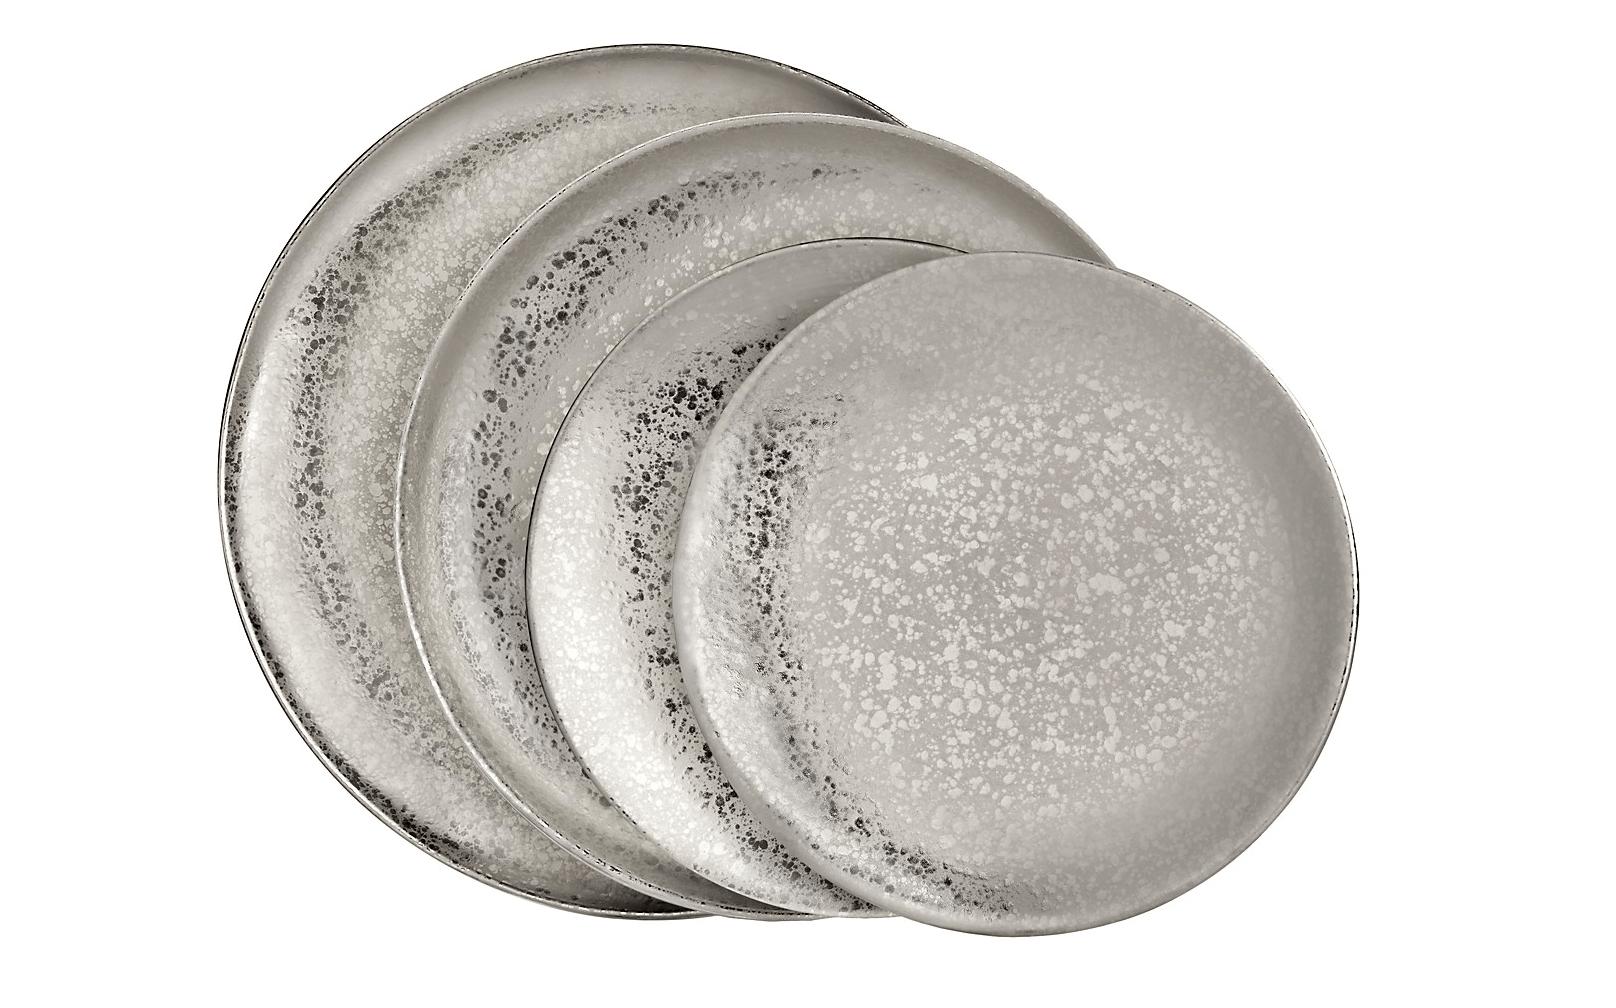 Platinum charger plates